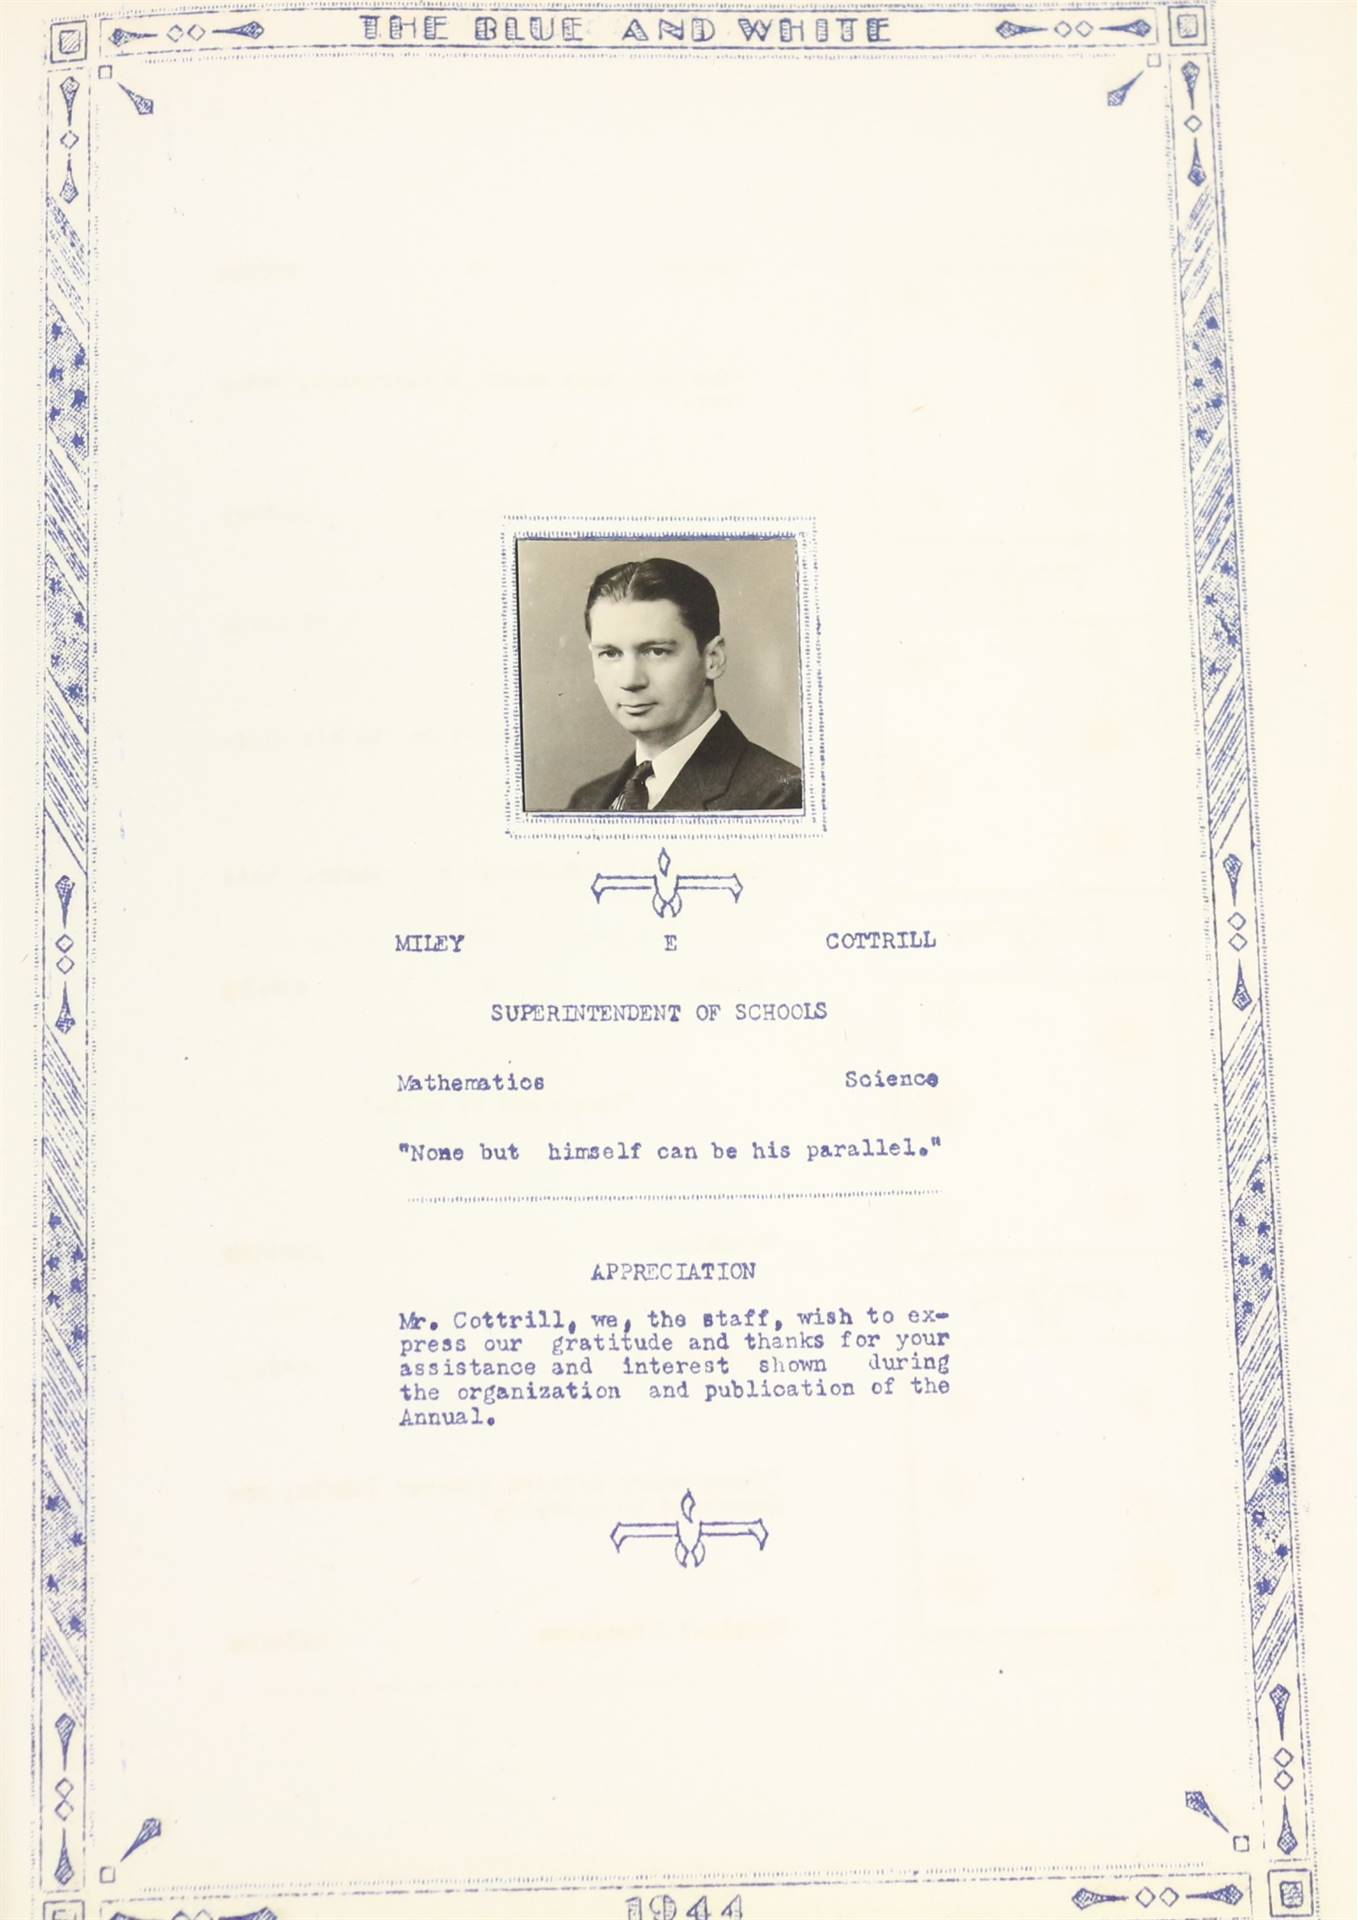 1944 superintendent